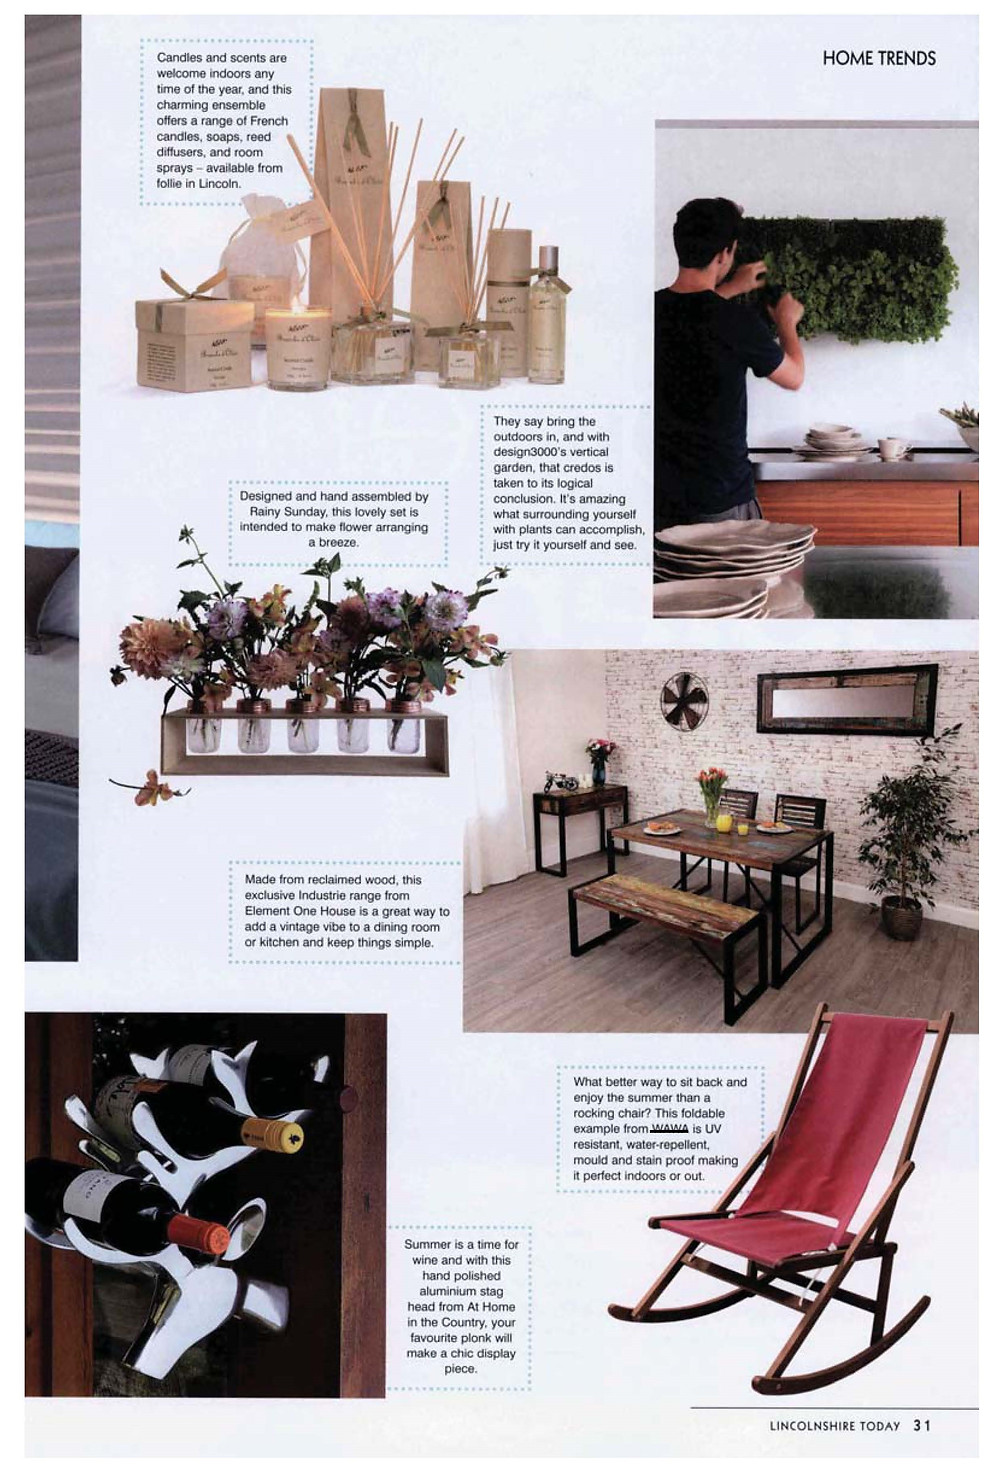 deckchairs-folding-rocking-chair-wawa-designer-outdoor-furniture-london-garden-chairs-outdoor-chairs-patio-furniture-summer-pool-side-summer-relaxing-summer-reads-chairs-waterproof-